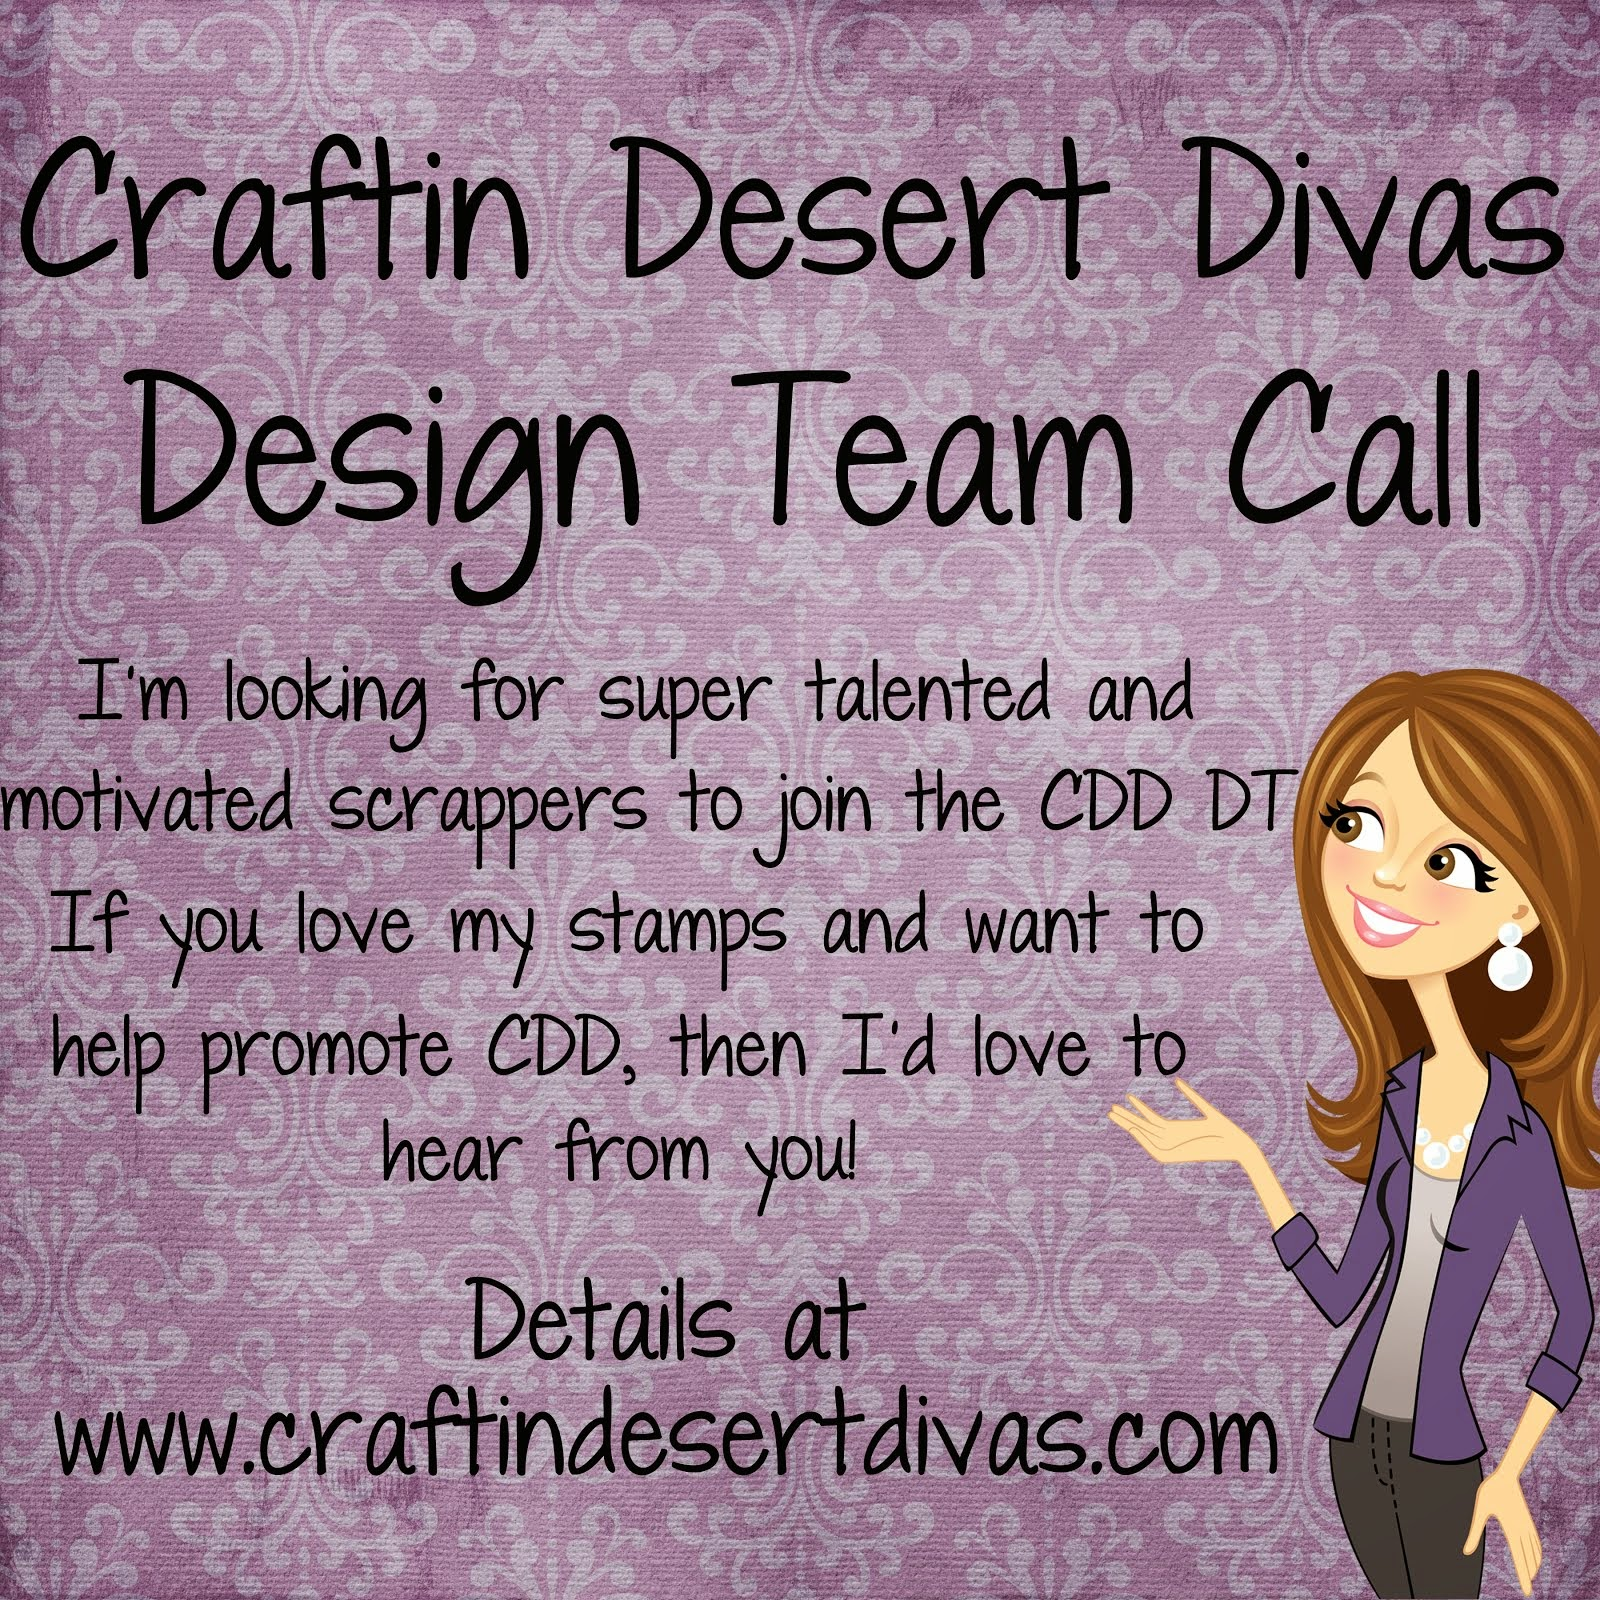 CDD Design Team Call